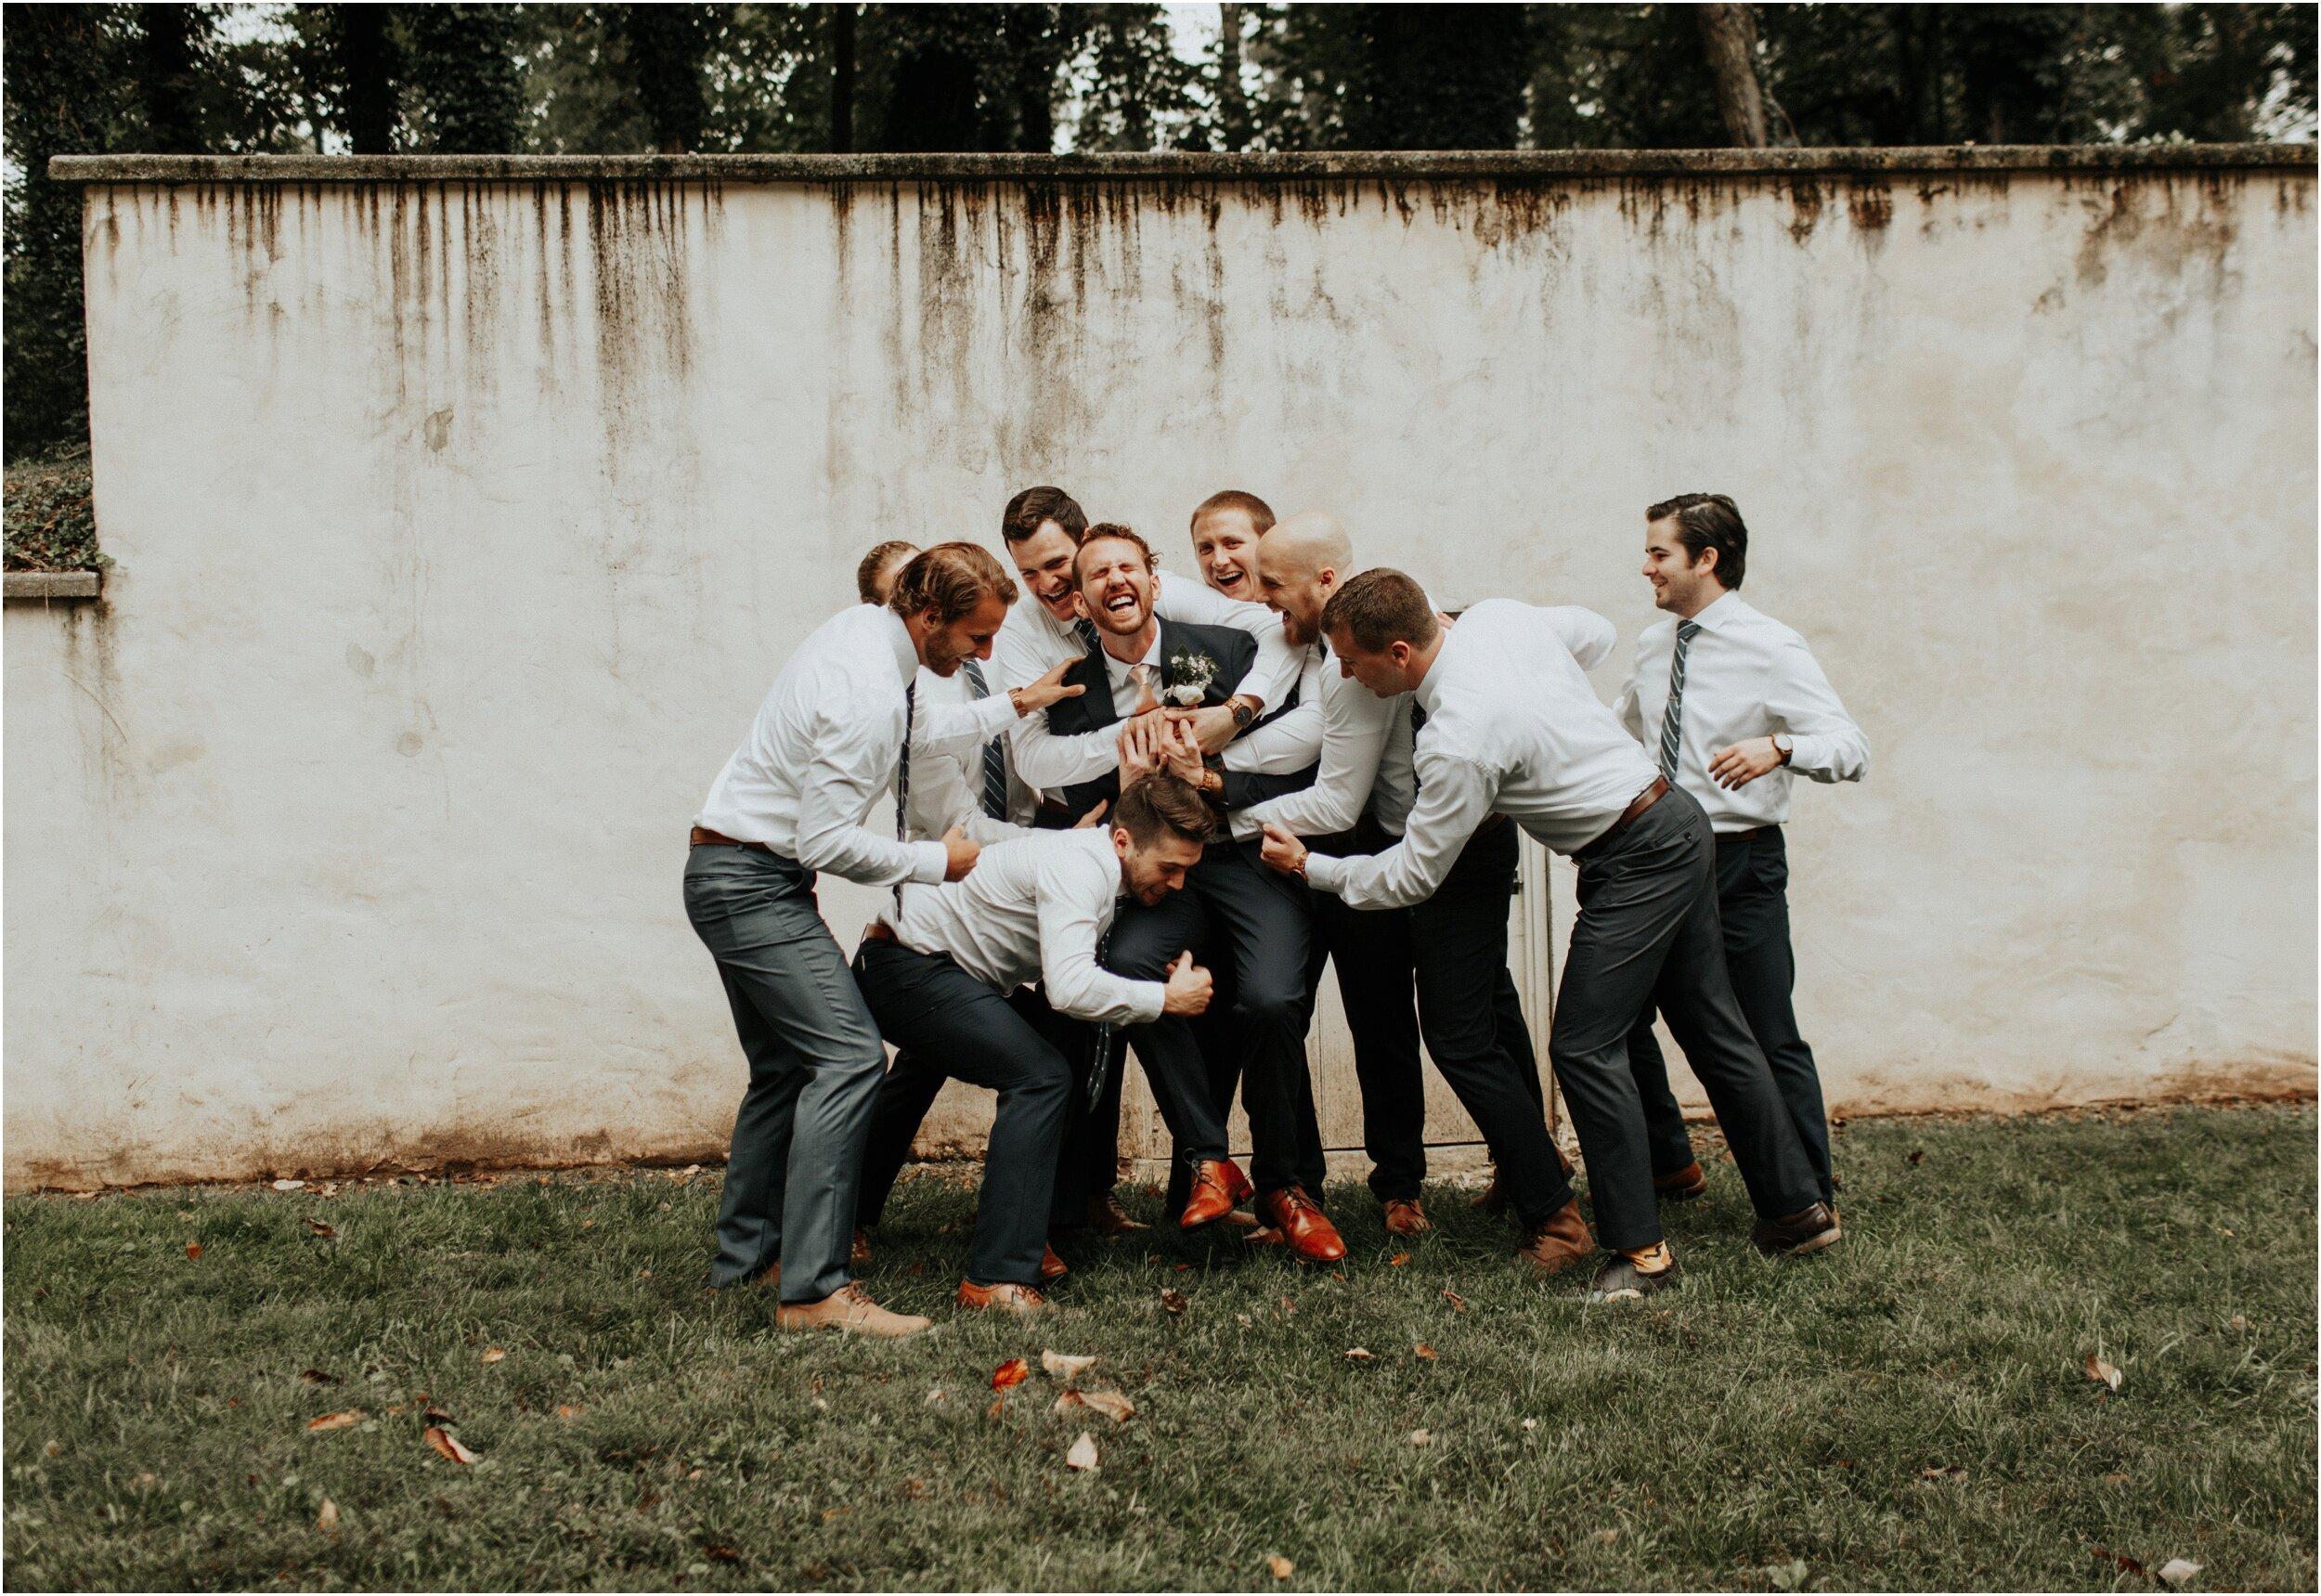 steph-and-jordan-cox-our-wedding-historic-shady-lane-compass-wedding-collective-hazel-lining-photography-destination-elopement-wedding-engagement-photography_0046.jpg